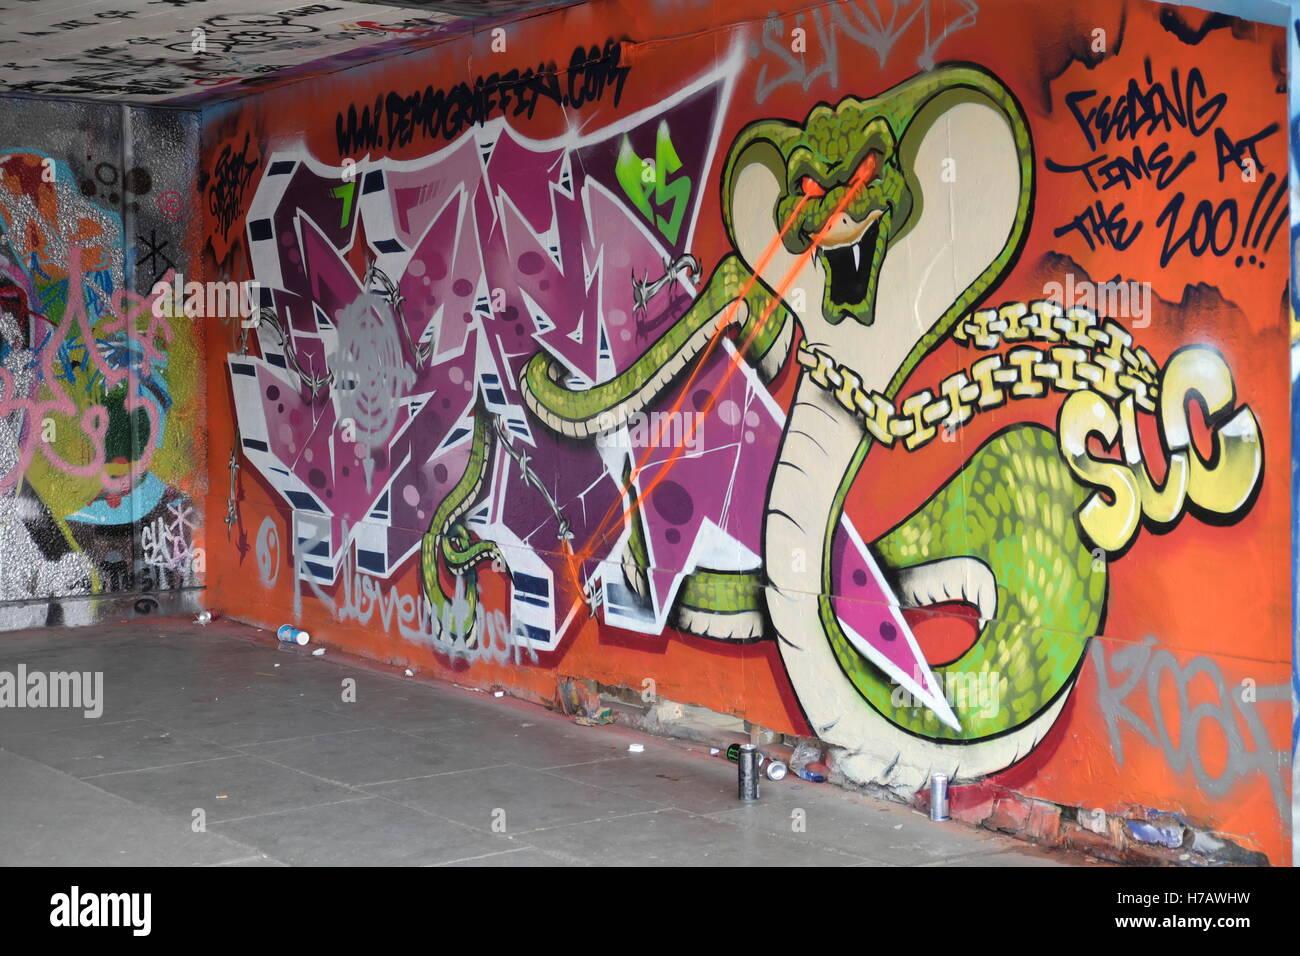 Graffiti at the skate park on londons south bank stock photo graffiti at the skate park on londons south bank altavistaventures Images